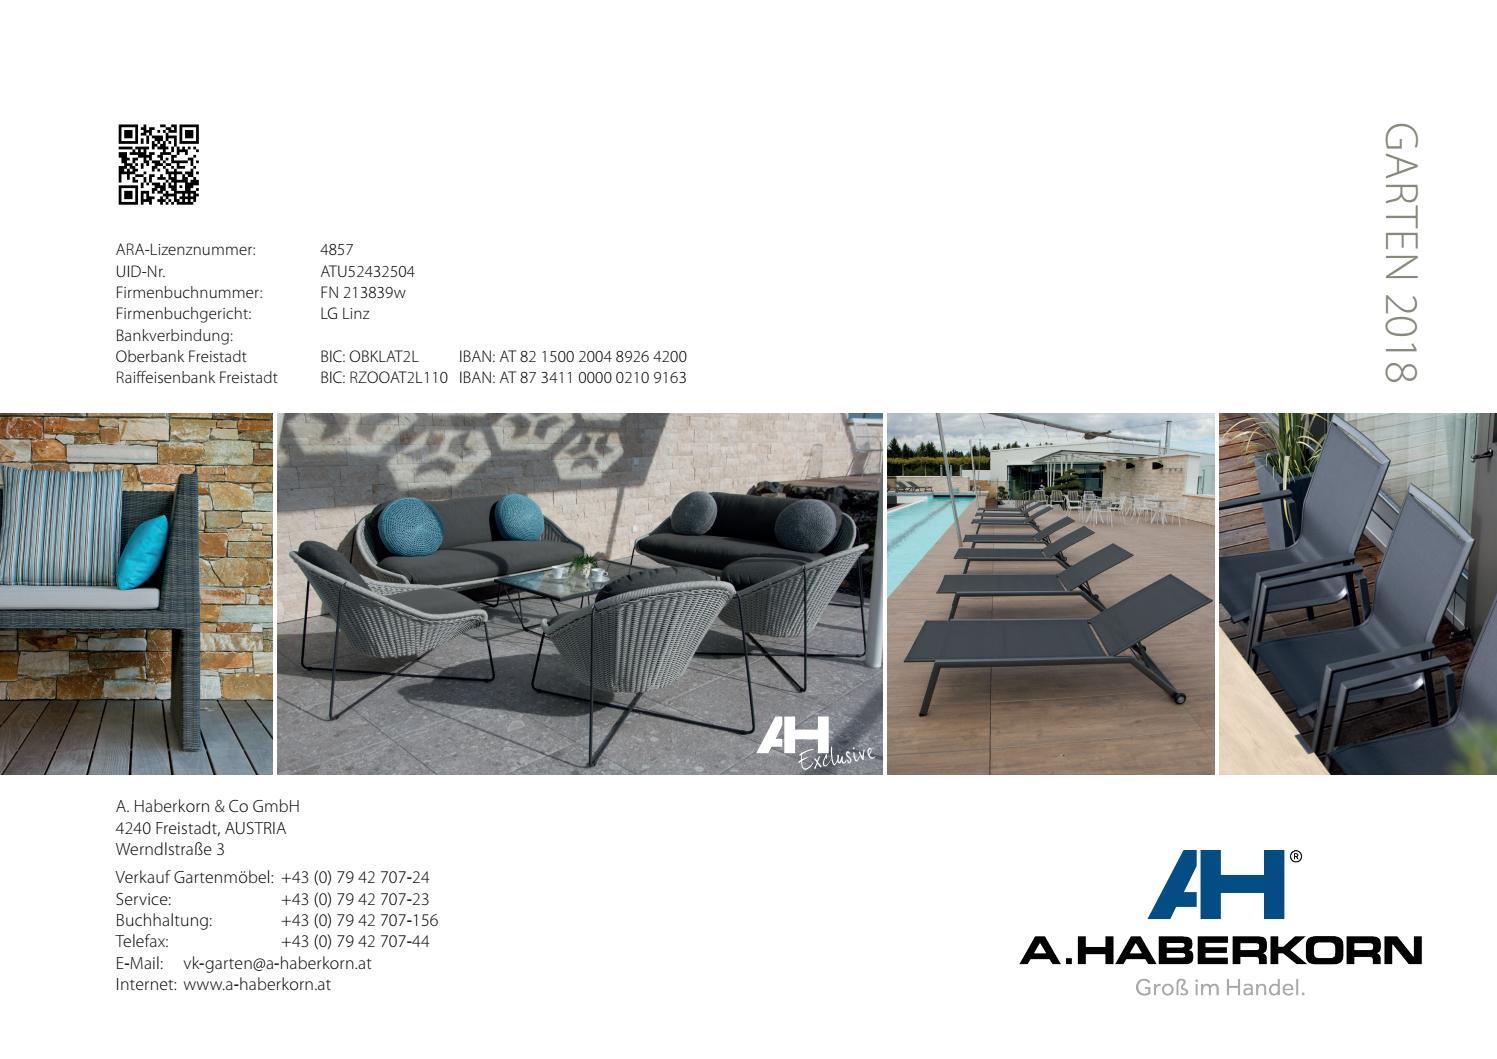 A. Haberkorn, Katalog Garten 2018 by Christof Neunteufel - issuu